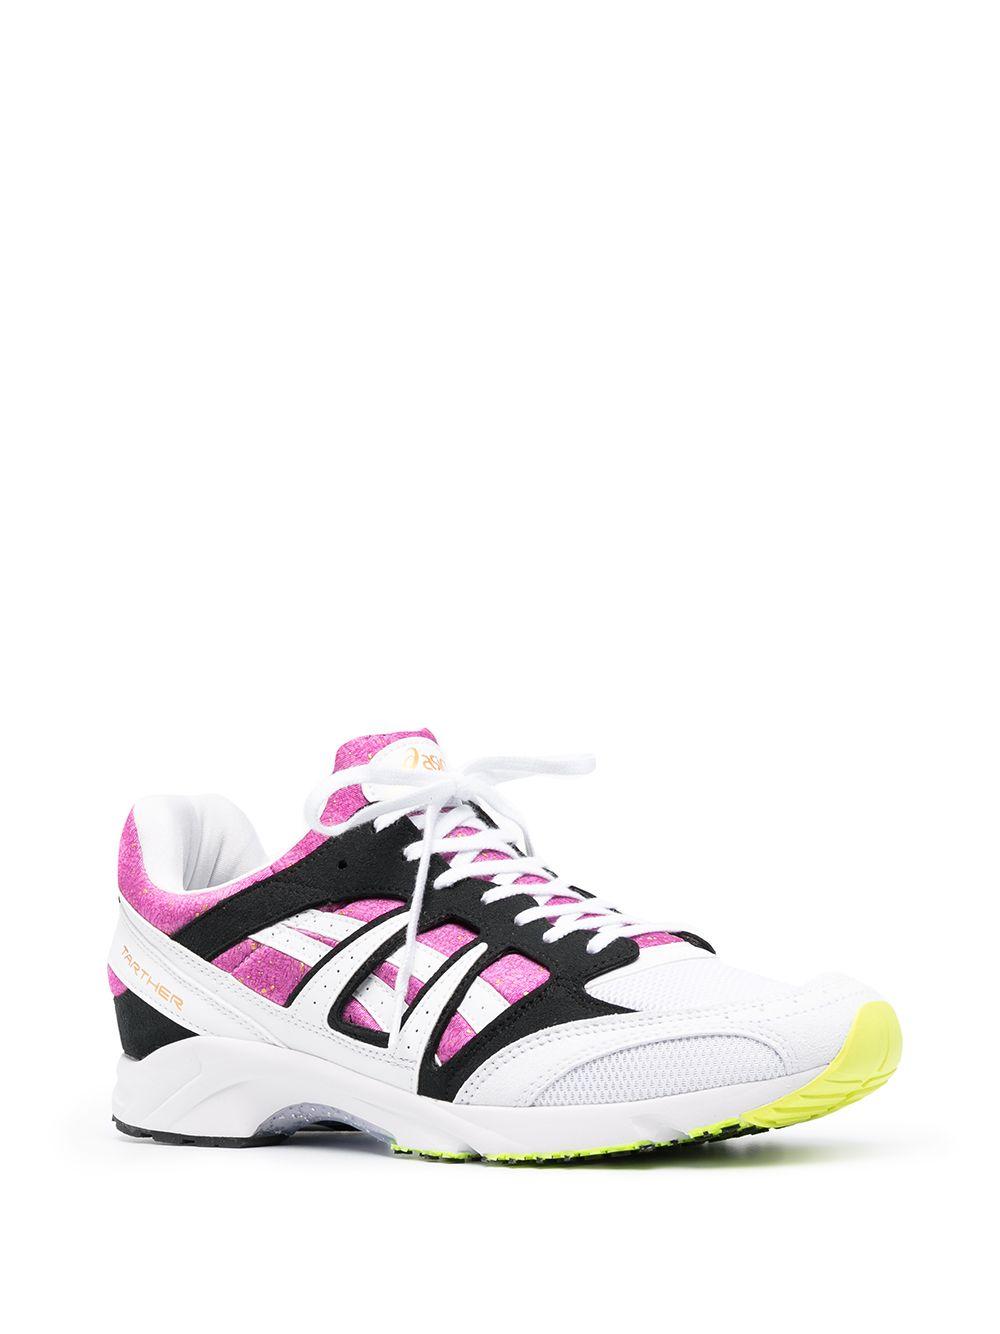 Comme Des Garçons Shirt x Asics sneakers unisex bianco COMME DES GARÇONS SHIRT | Sneakers | FG-K100PINK